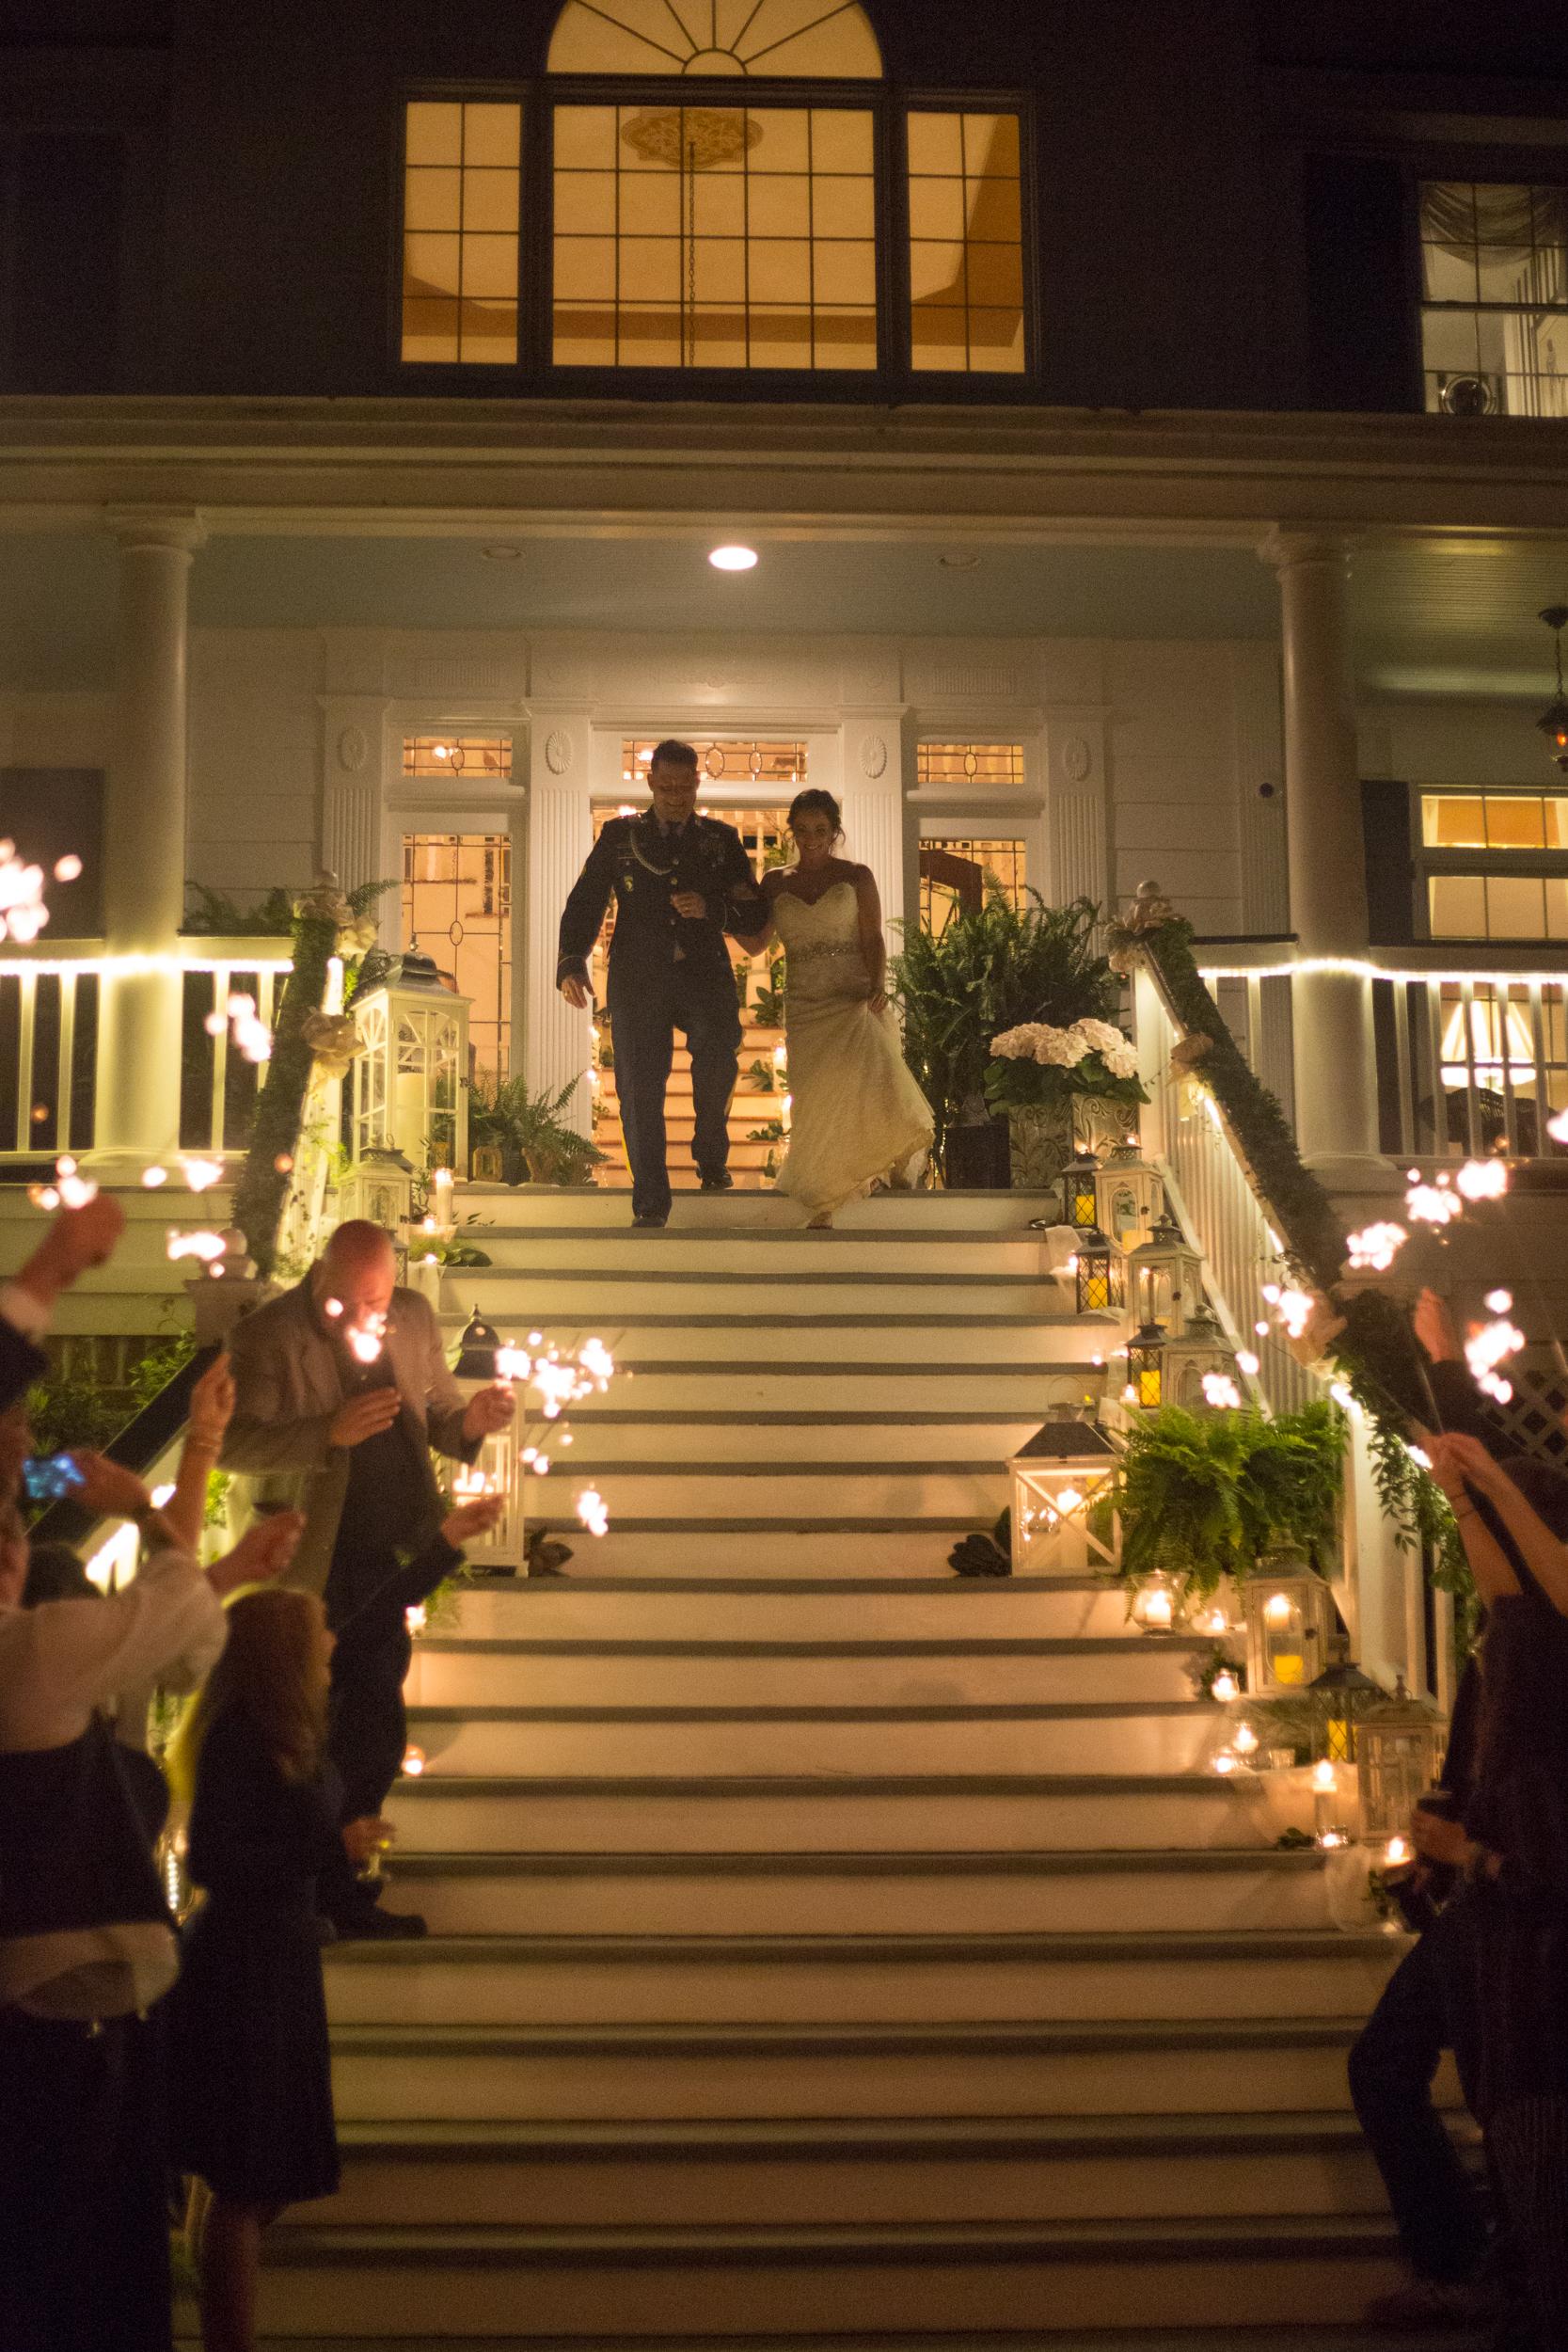 savannah-mackey-house-wedding-29.jpg